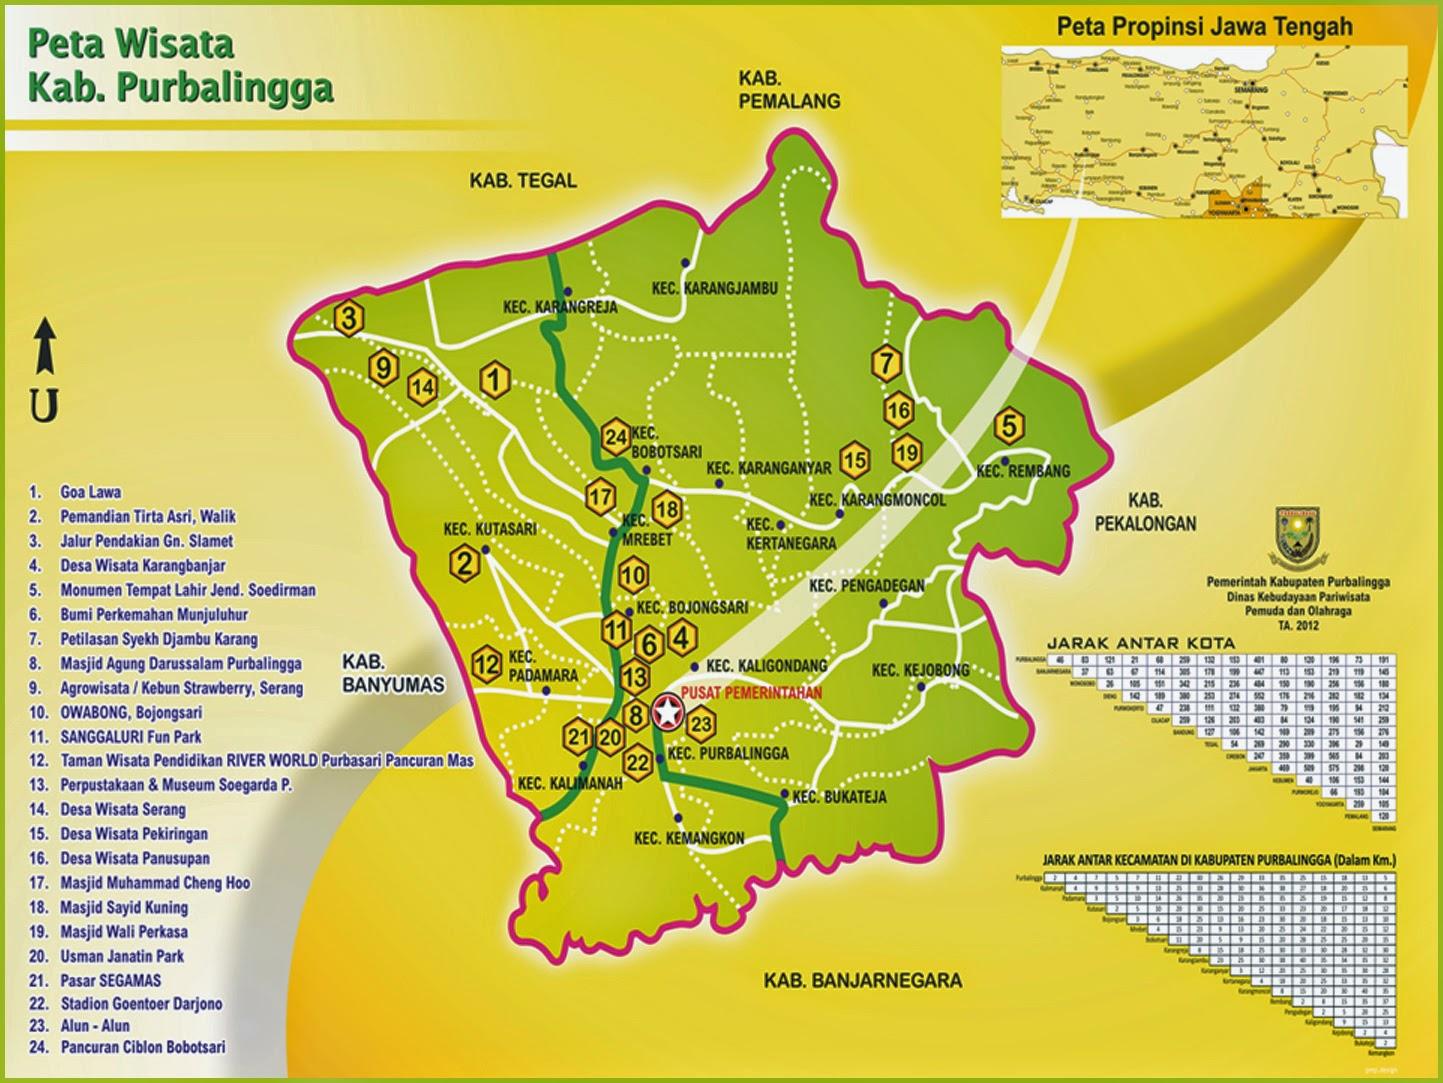 Peta Wisata Purbalingga